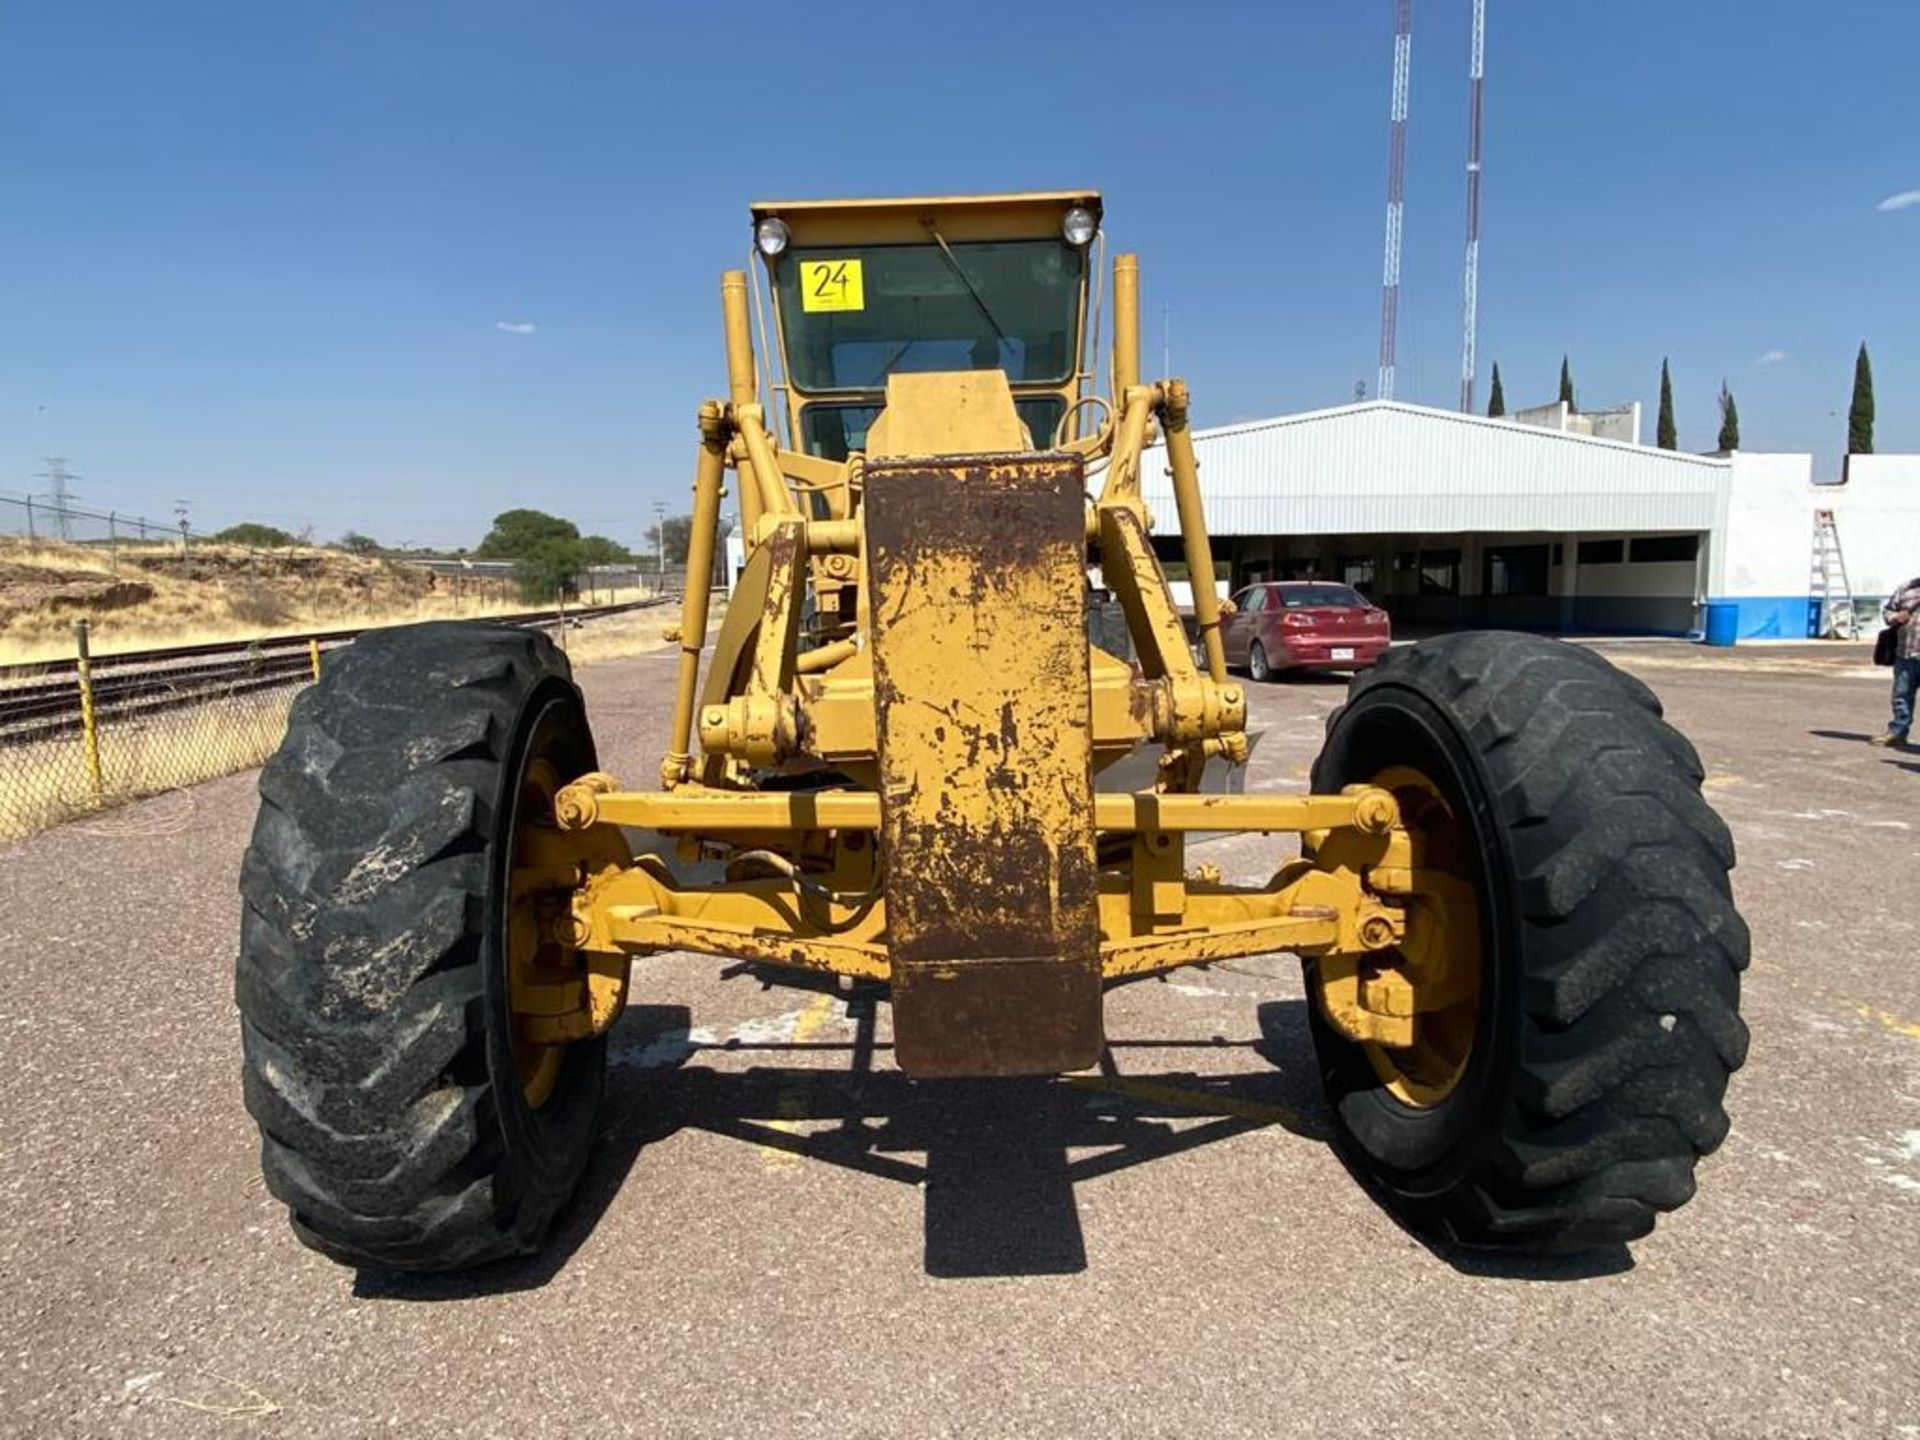 Caterpillar 120G Motor Grader, Serial number 87V09646, Motor number PQ883-2/07Z28983 - Image 4 of 61